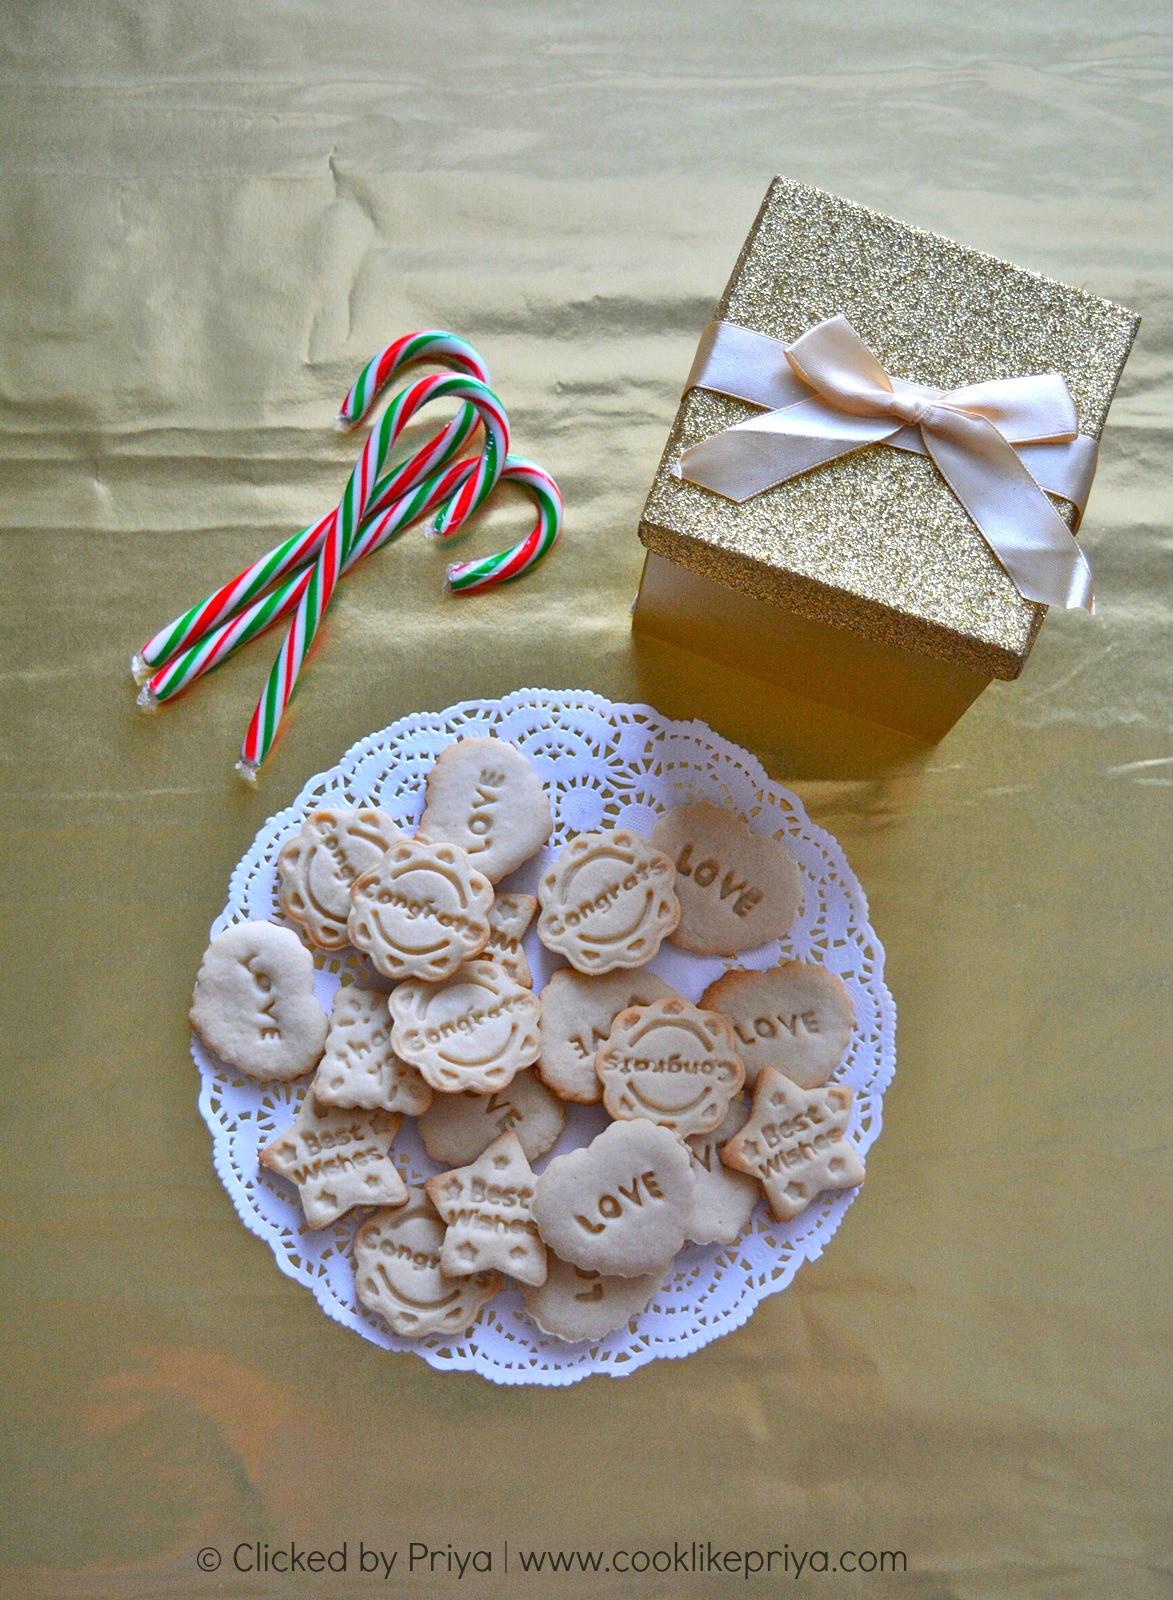 Eggless Christmas Cookies  Cook like Priya Eggless Sugar Cookies